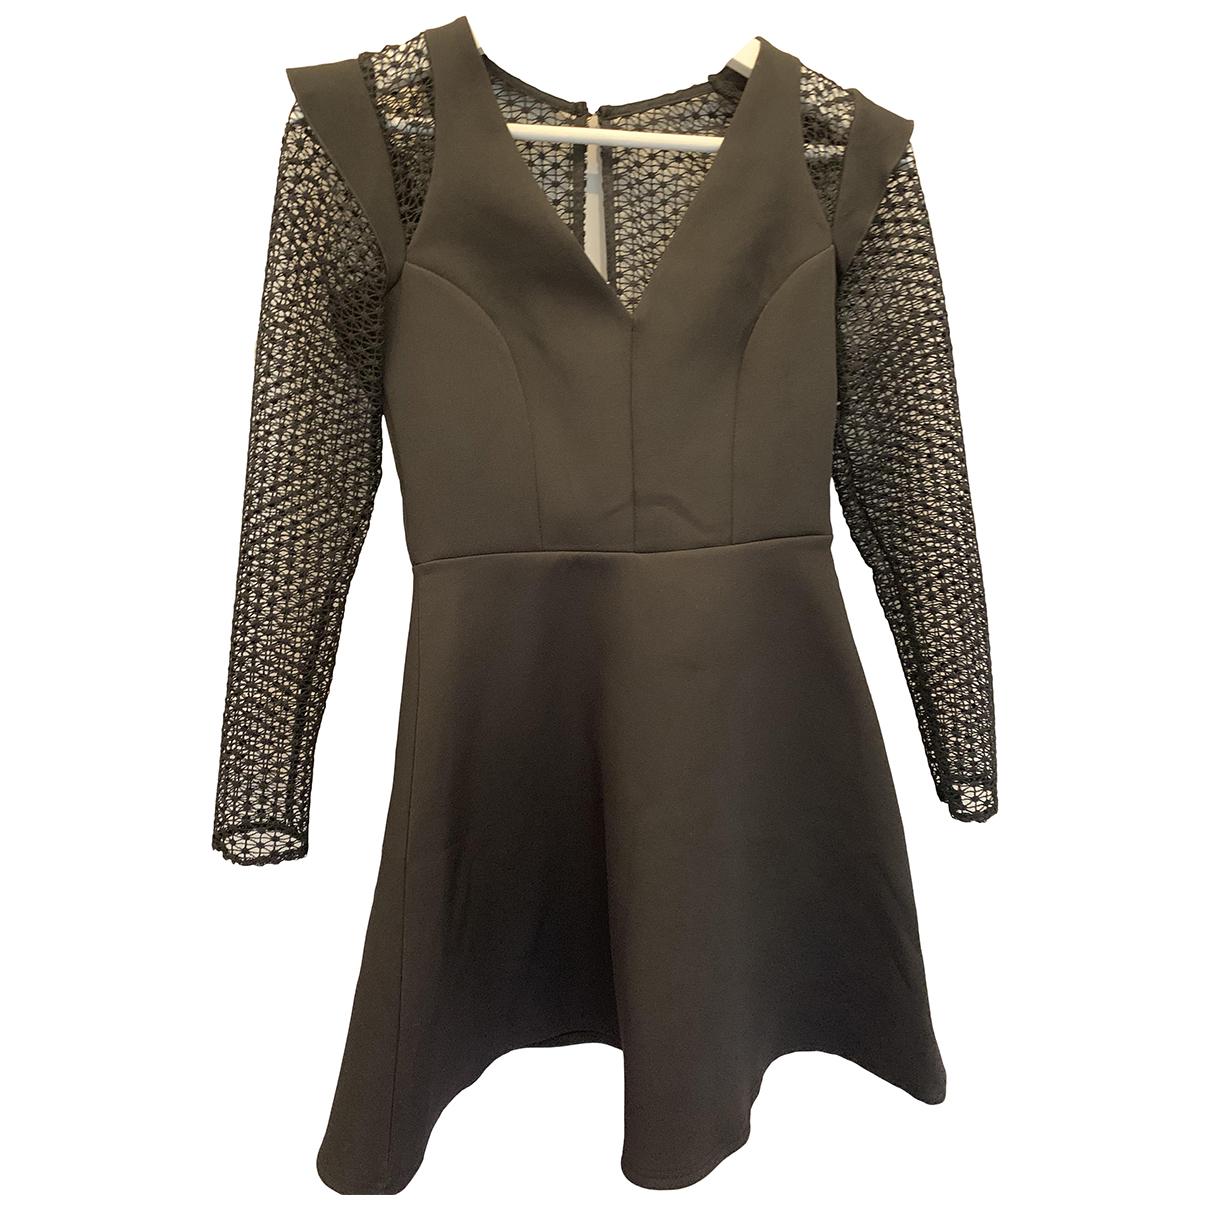 River Island N Black dress for Women 6 UK